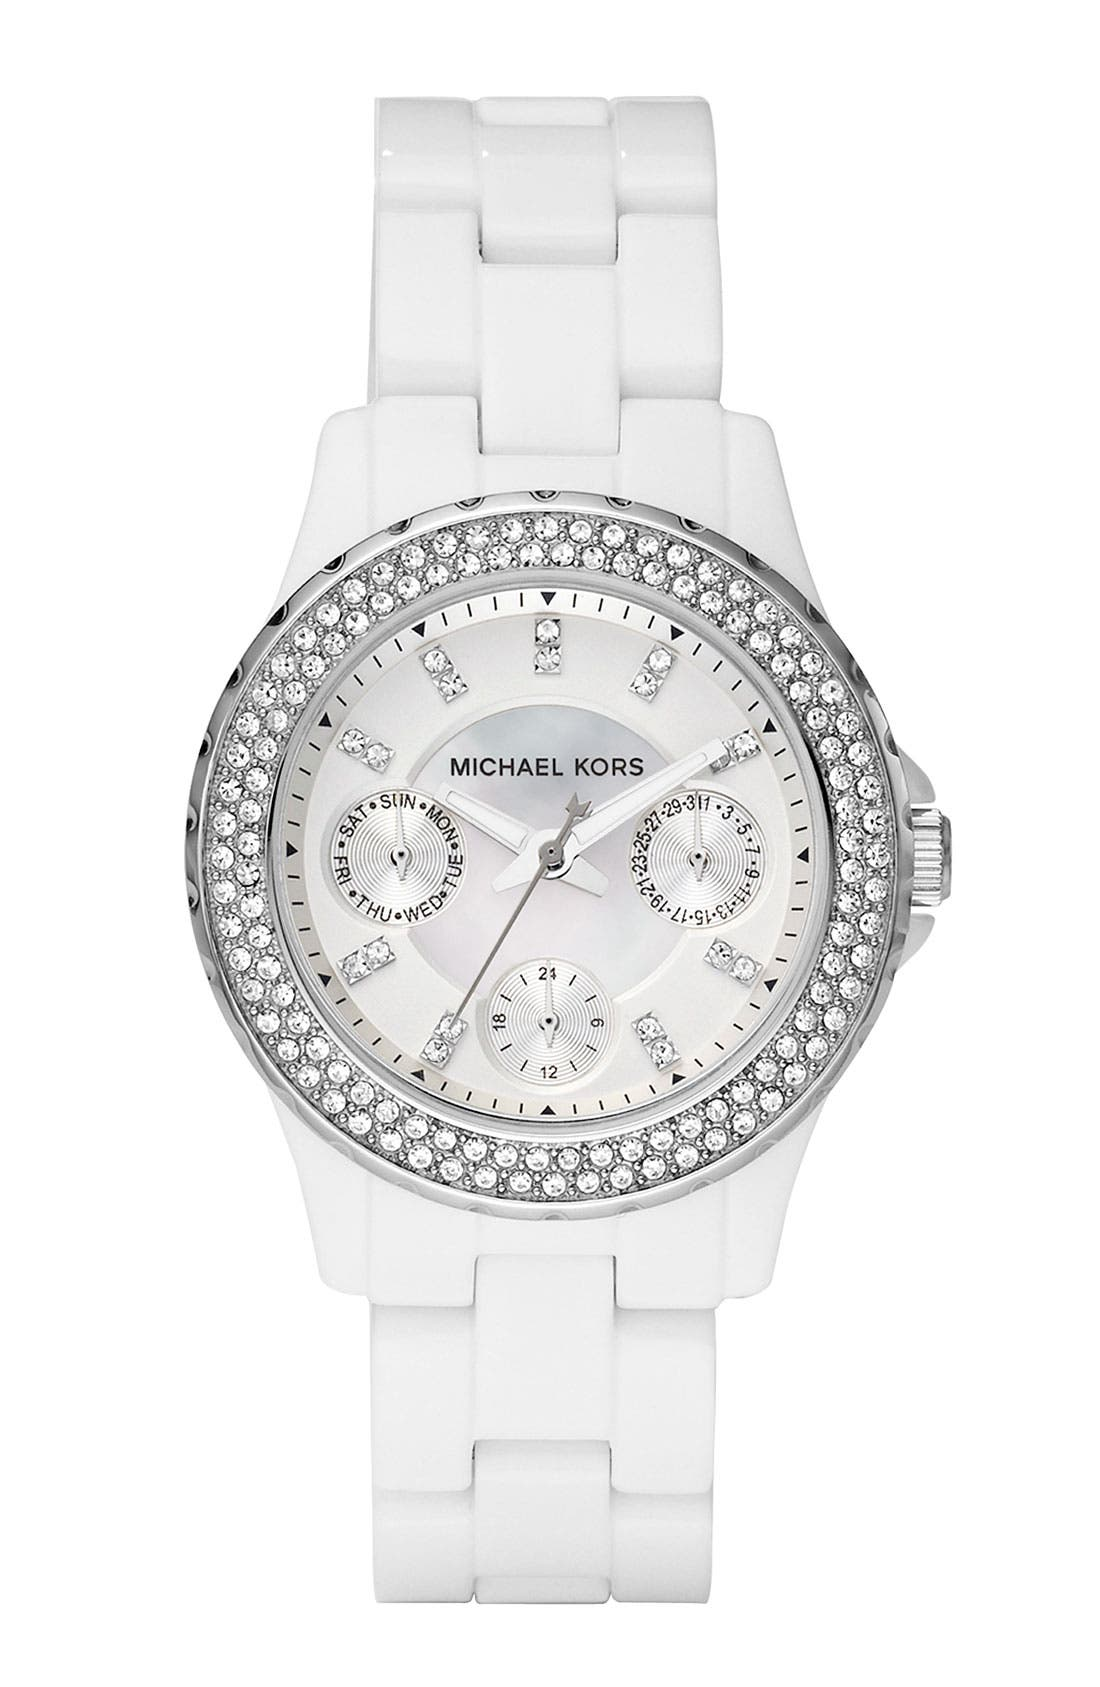 Main Image - Michael Kors 'Small Madison' Multifunction Watch